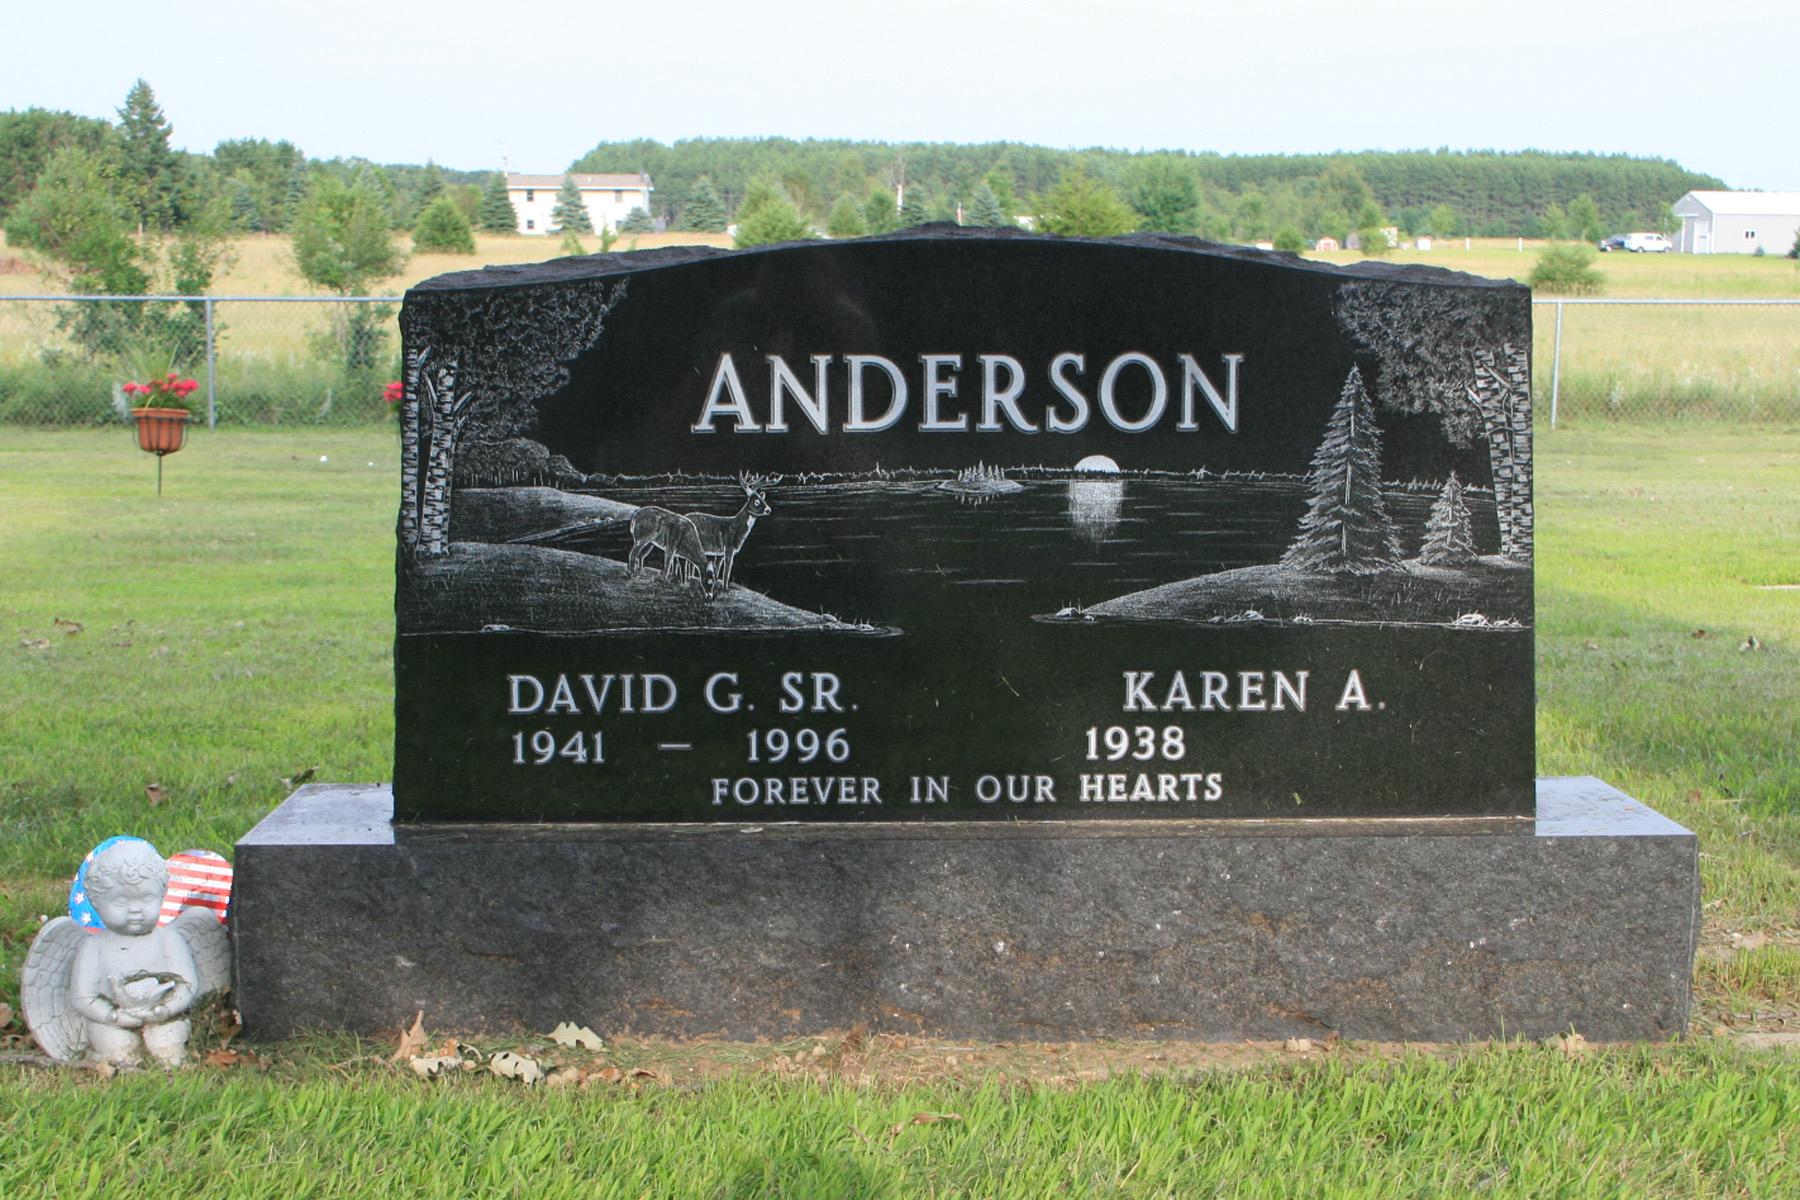 David Gordon Anderson, Sr